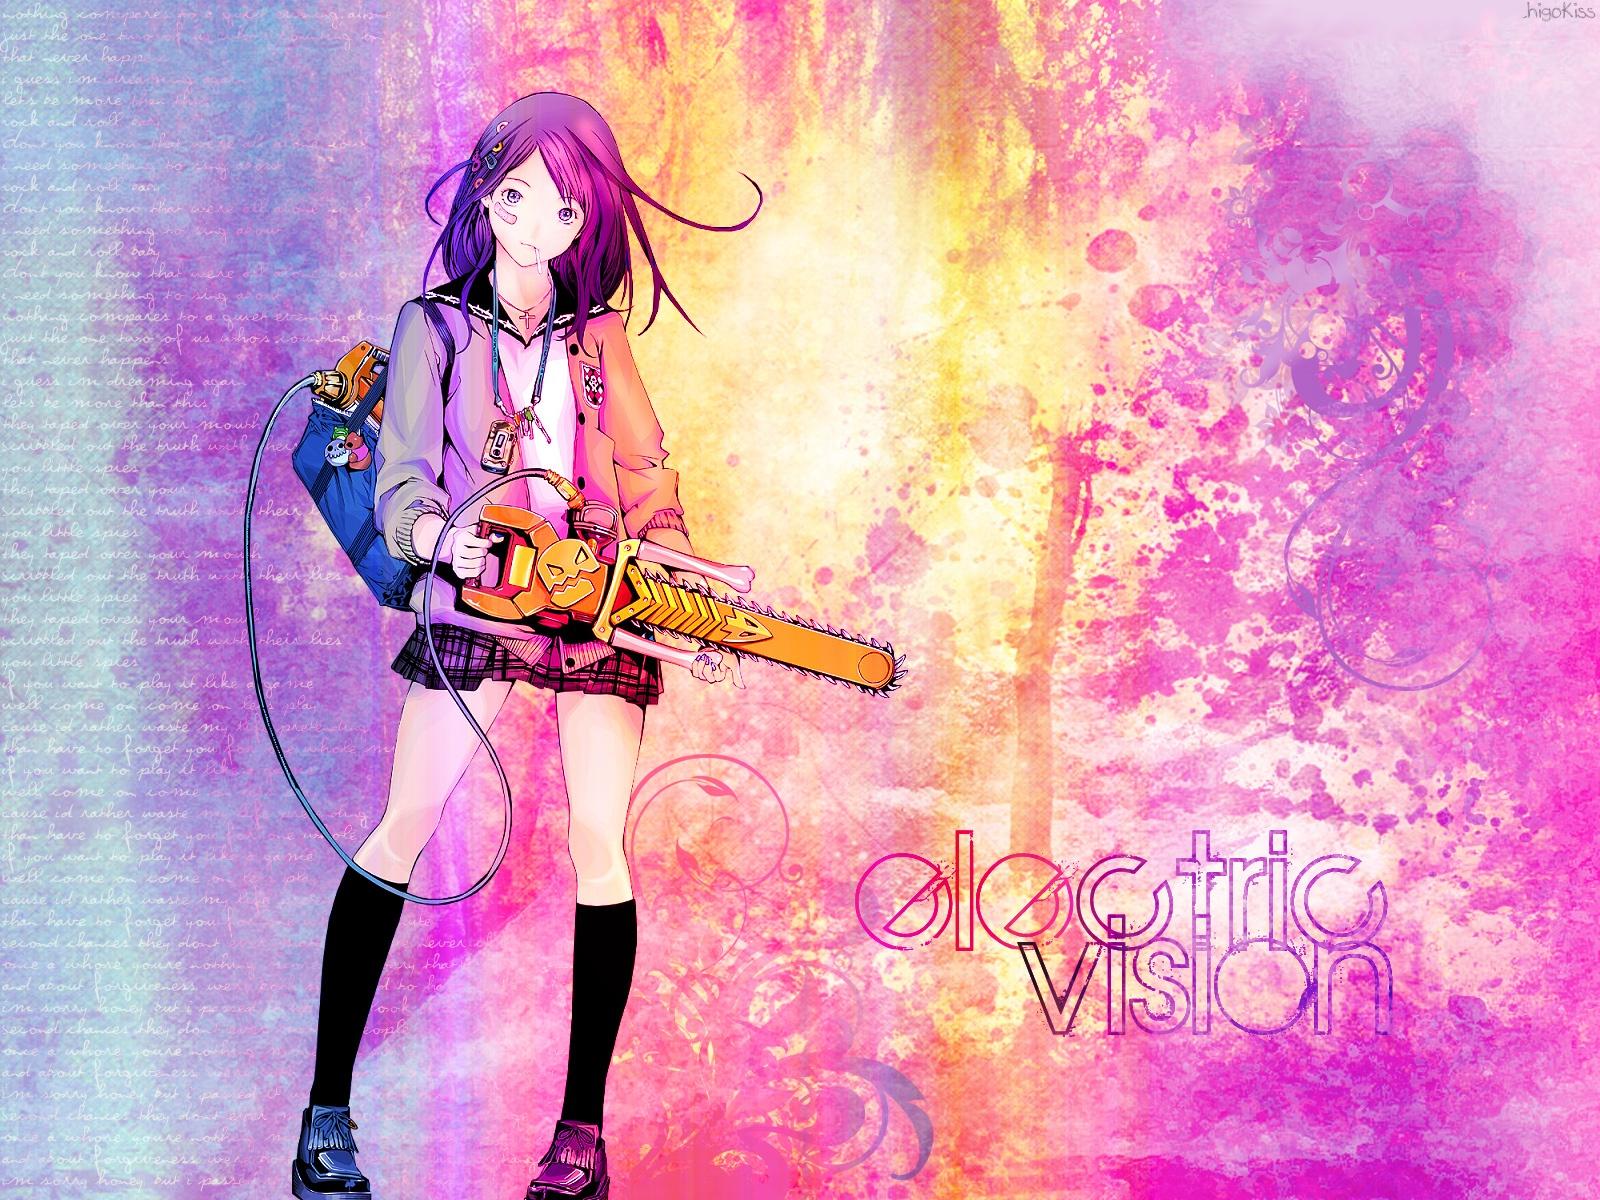 bandage chainsaw kneehighs long_hair necklace oh_great original phone purple_eyes purple_hair school_uniform skirt